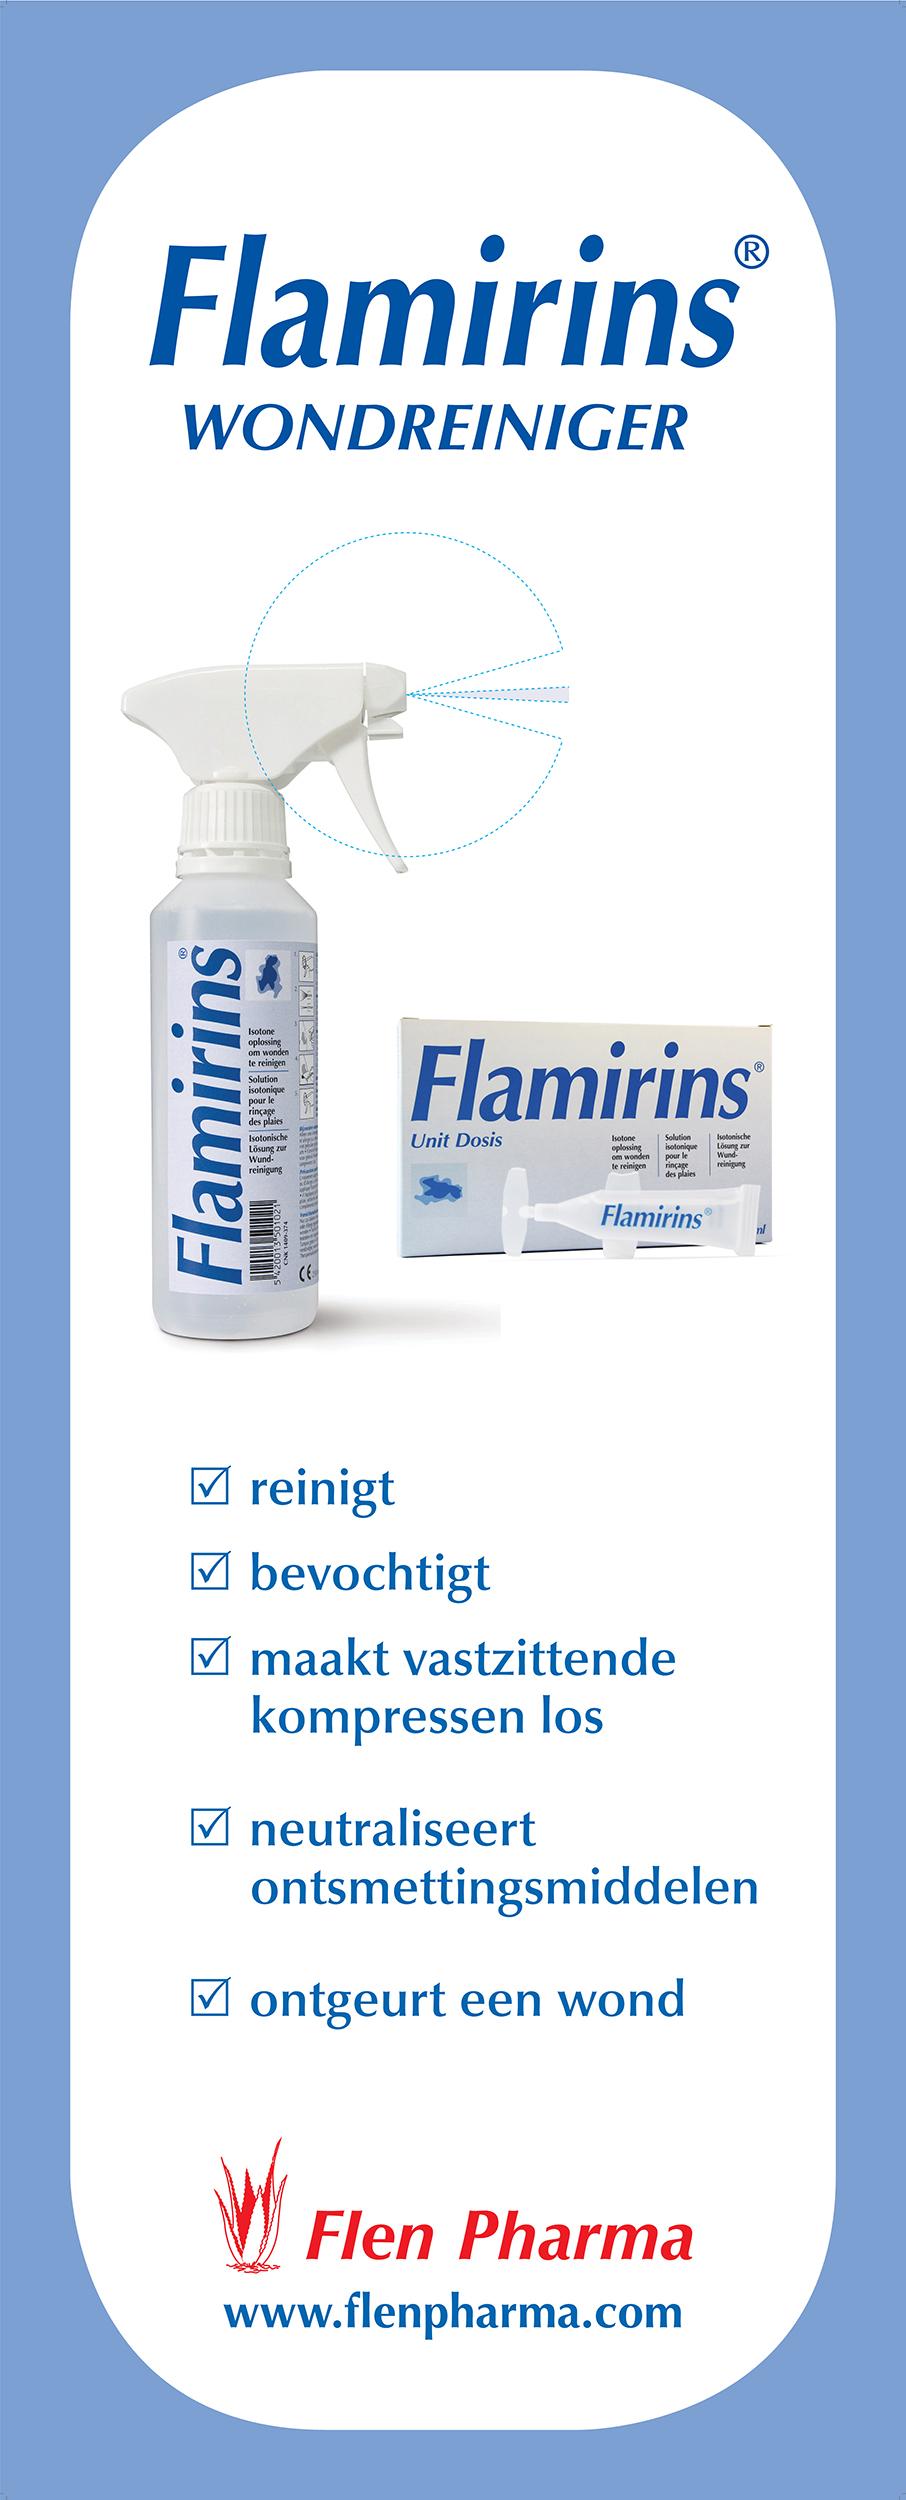 Flen Pharma Flamirins